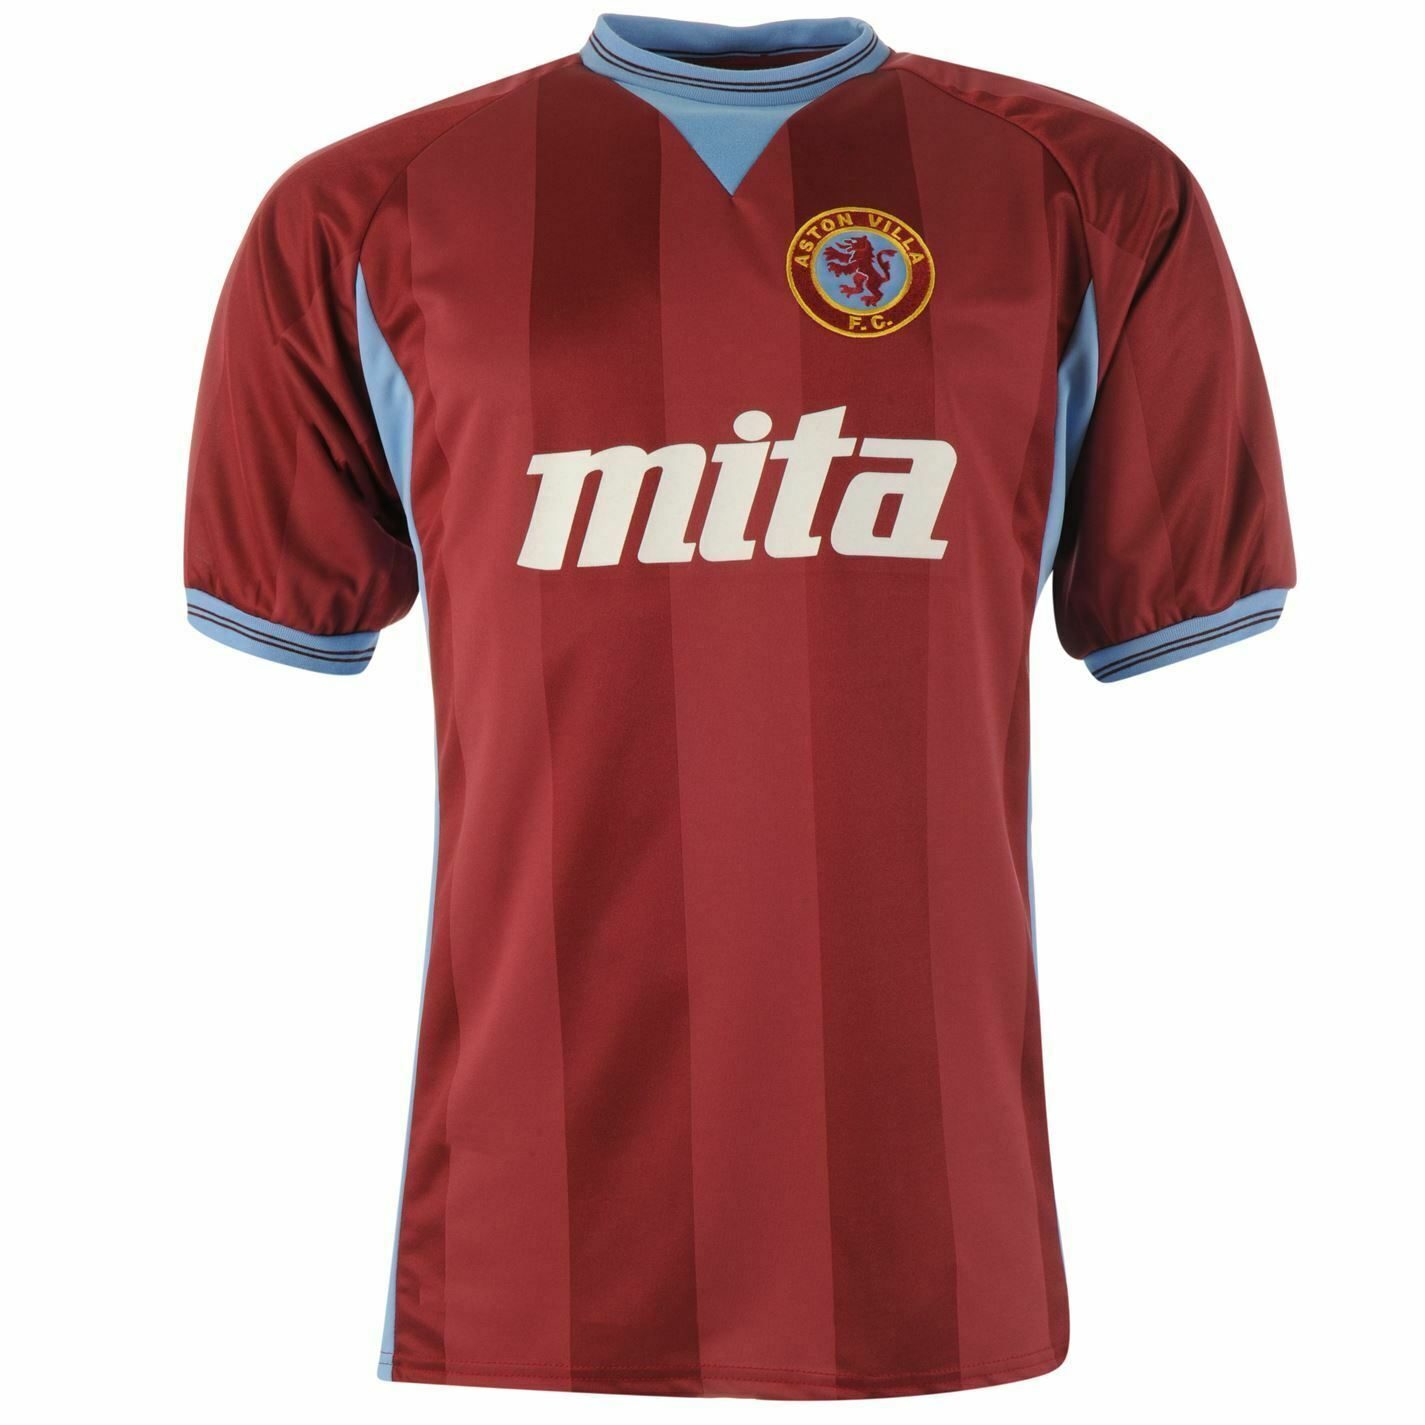 Aston Villa 1984 Retro Heim Trikot Herren Claret Fußball Fan Hemd T-Shirt